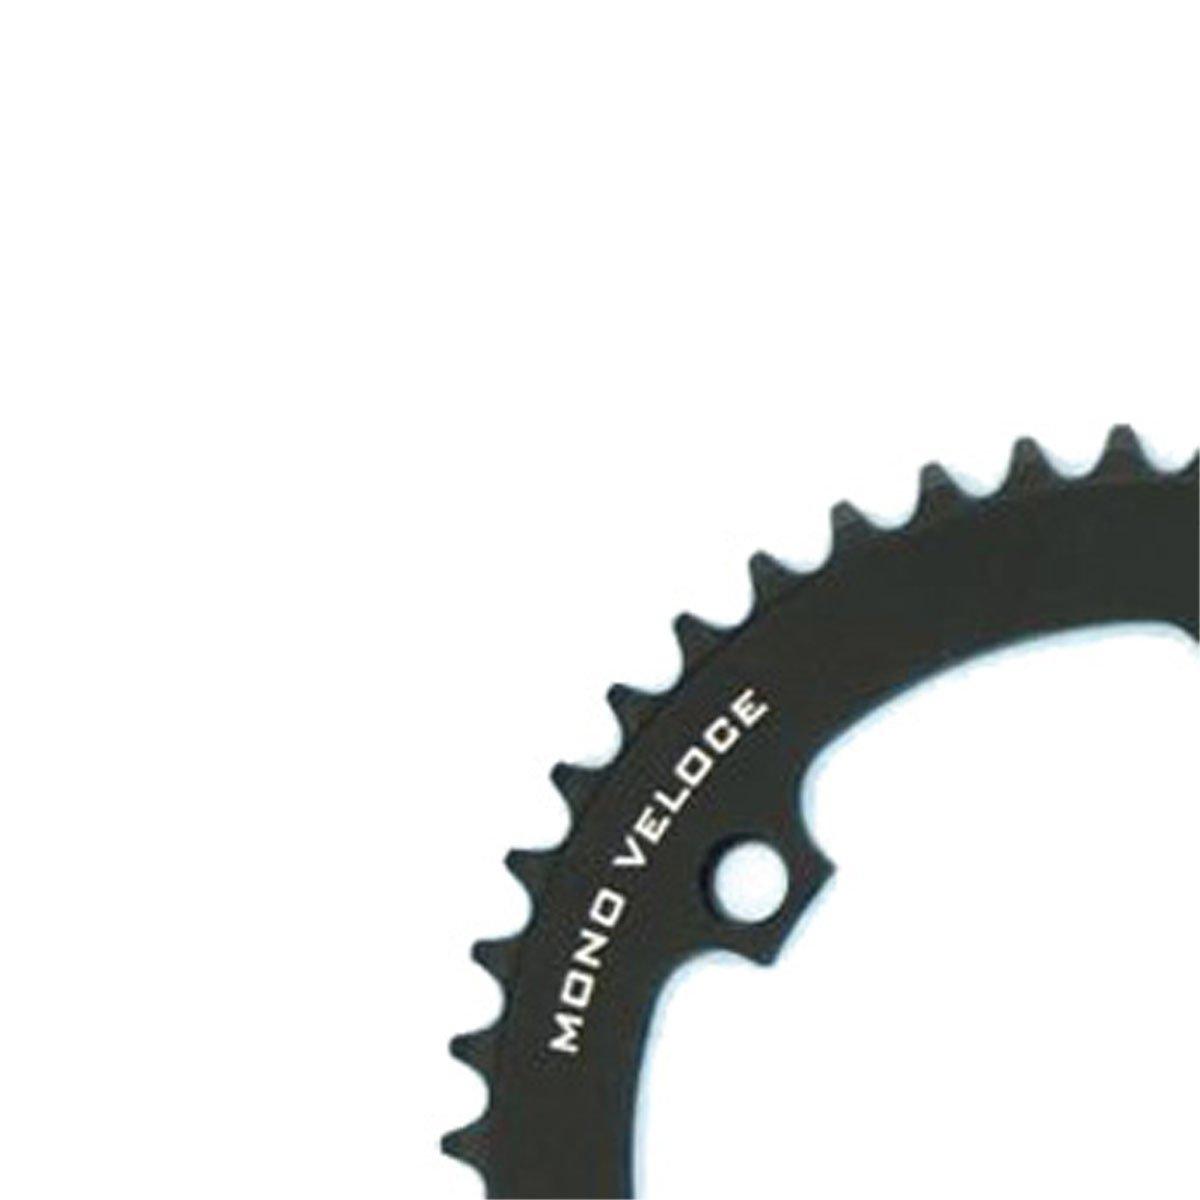 Blackspire Monoveloce 104mm BCD Monoveloce Ring 104/32T 3/32'' Chain by Blackspire   B00BGDO0M4